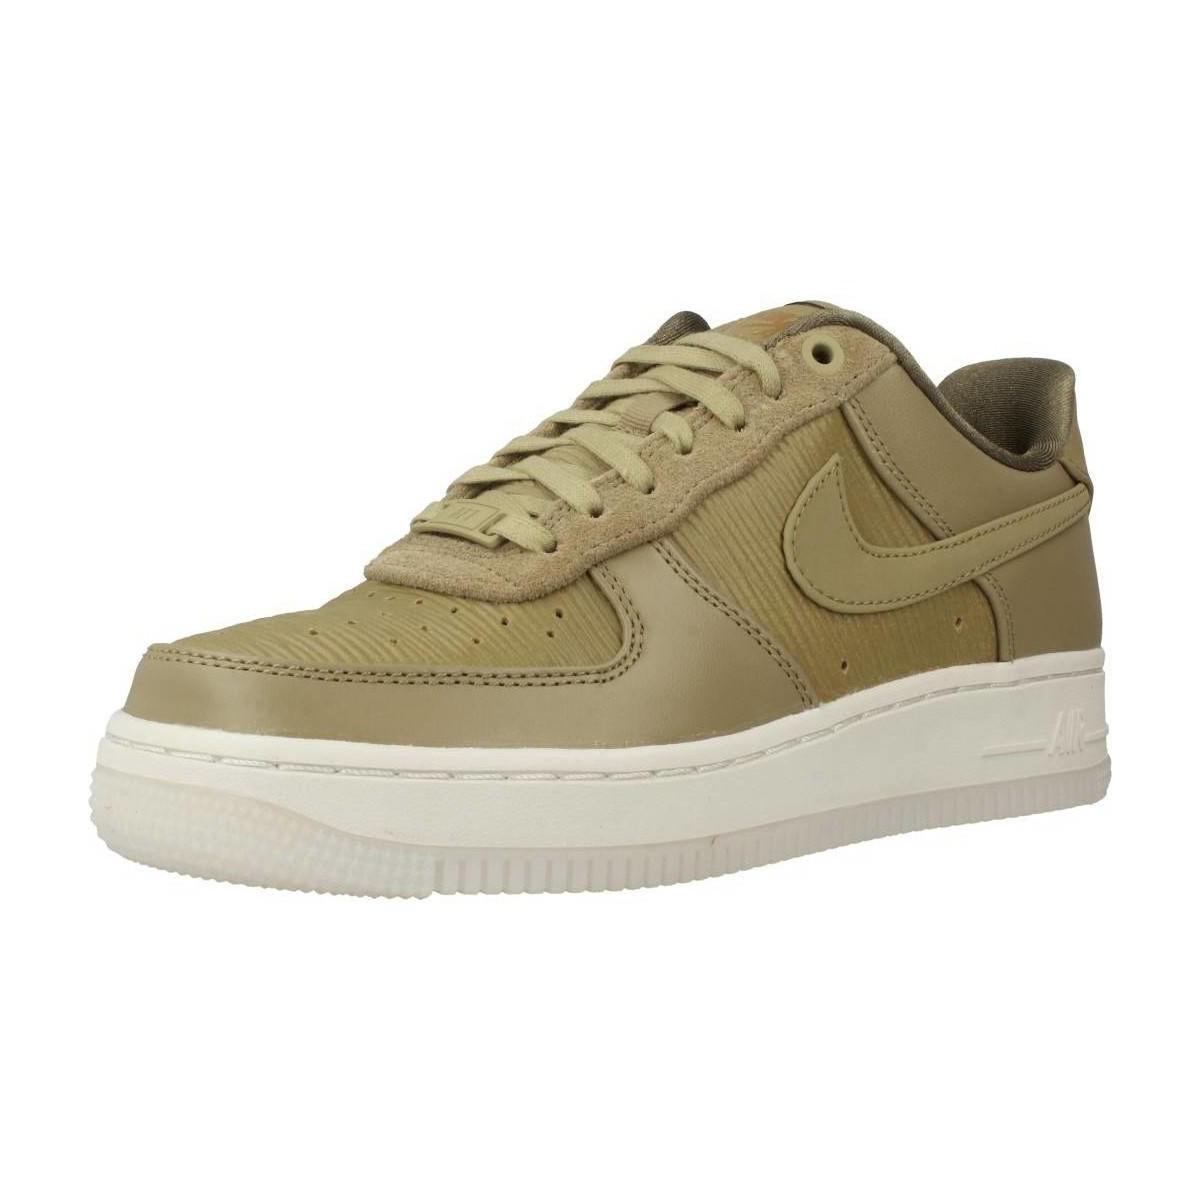 1be5de5102aeda Sneakers women Nike Air Force 1 Upstep Artic Orange t